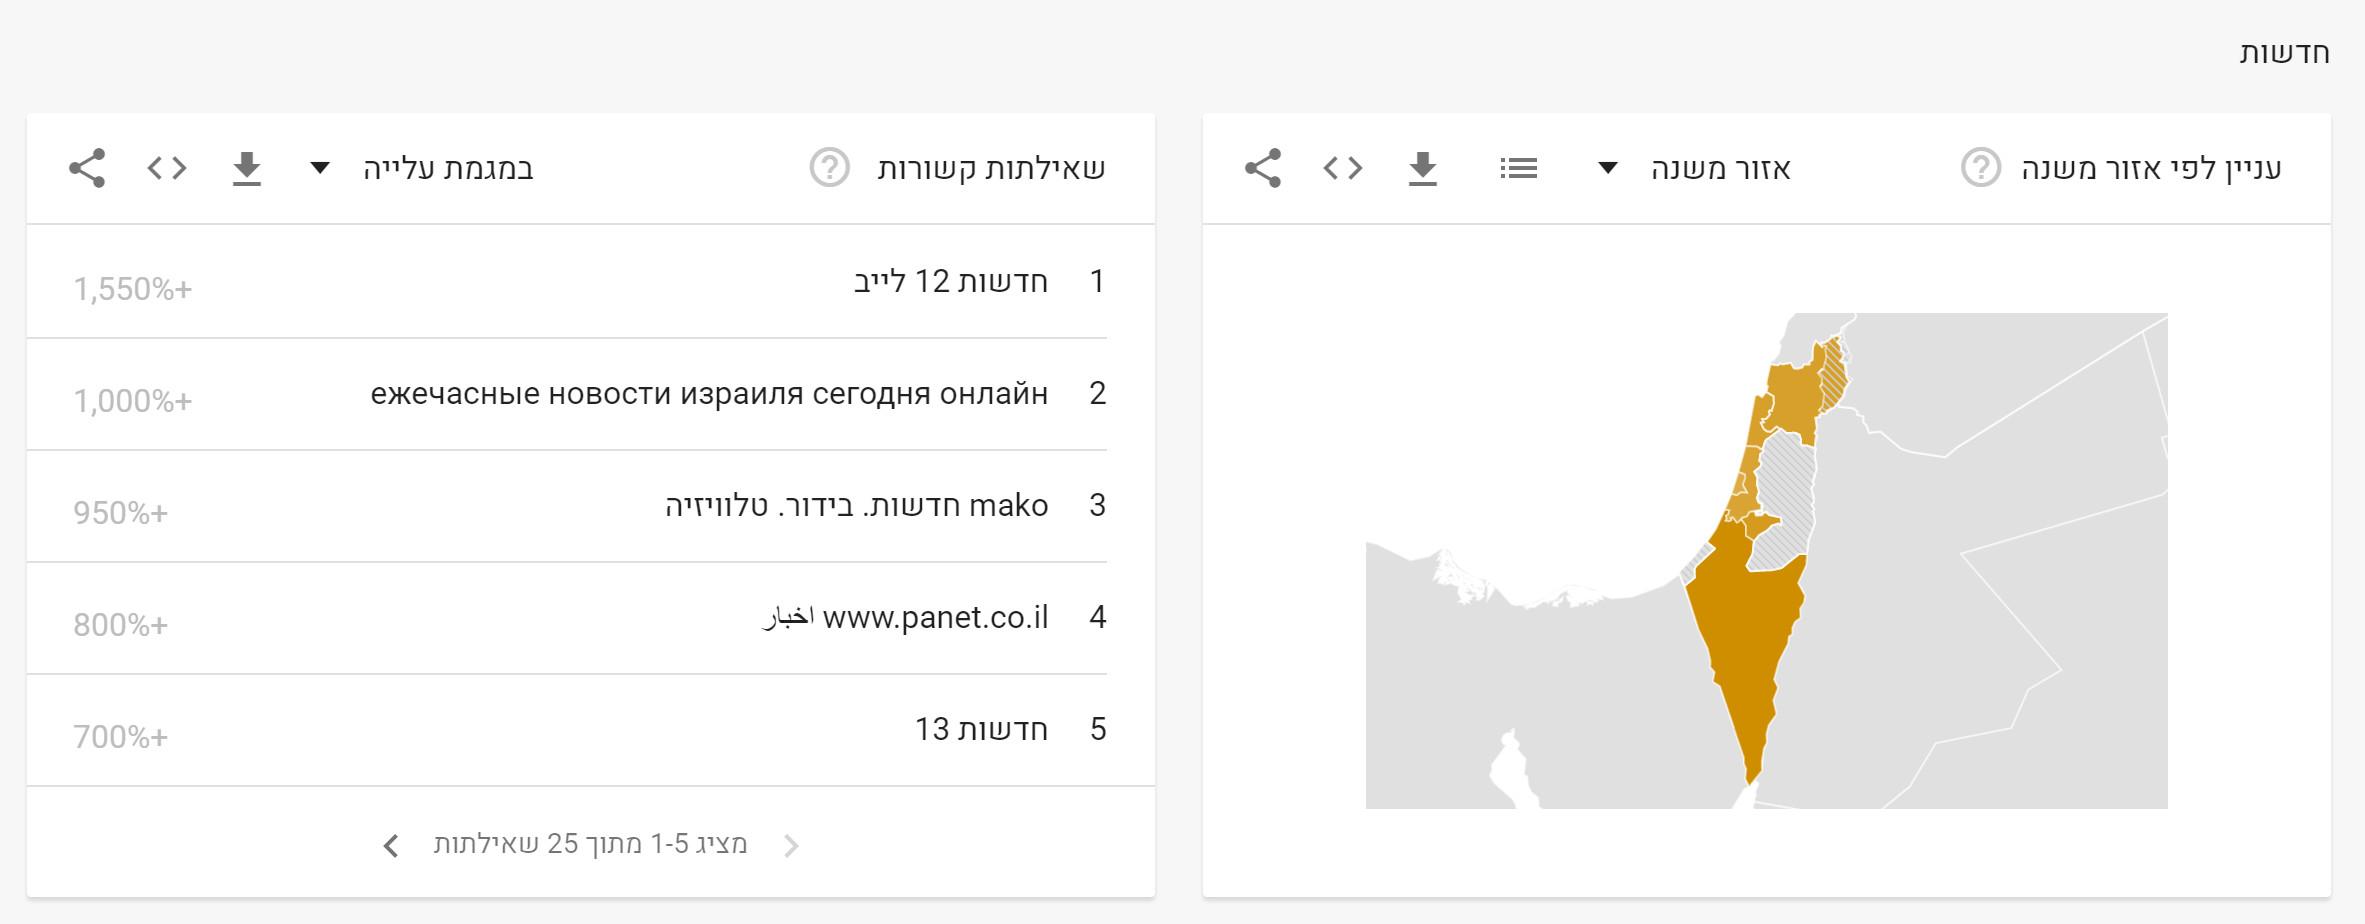 News 2019 in Google (7)